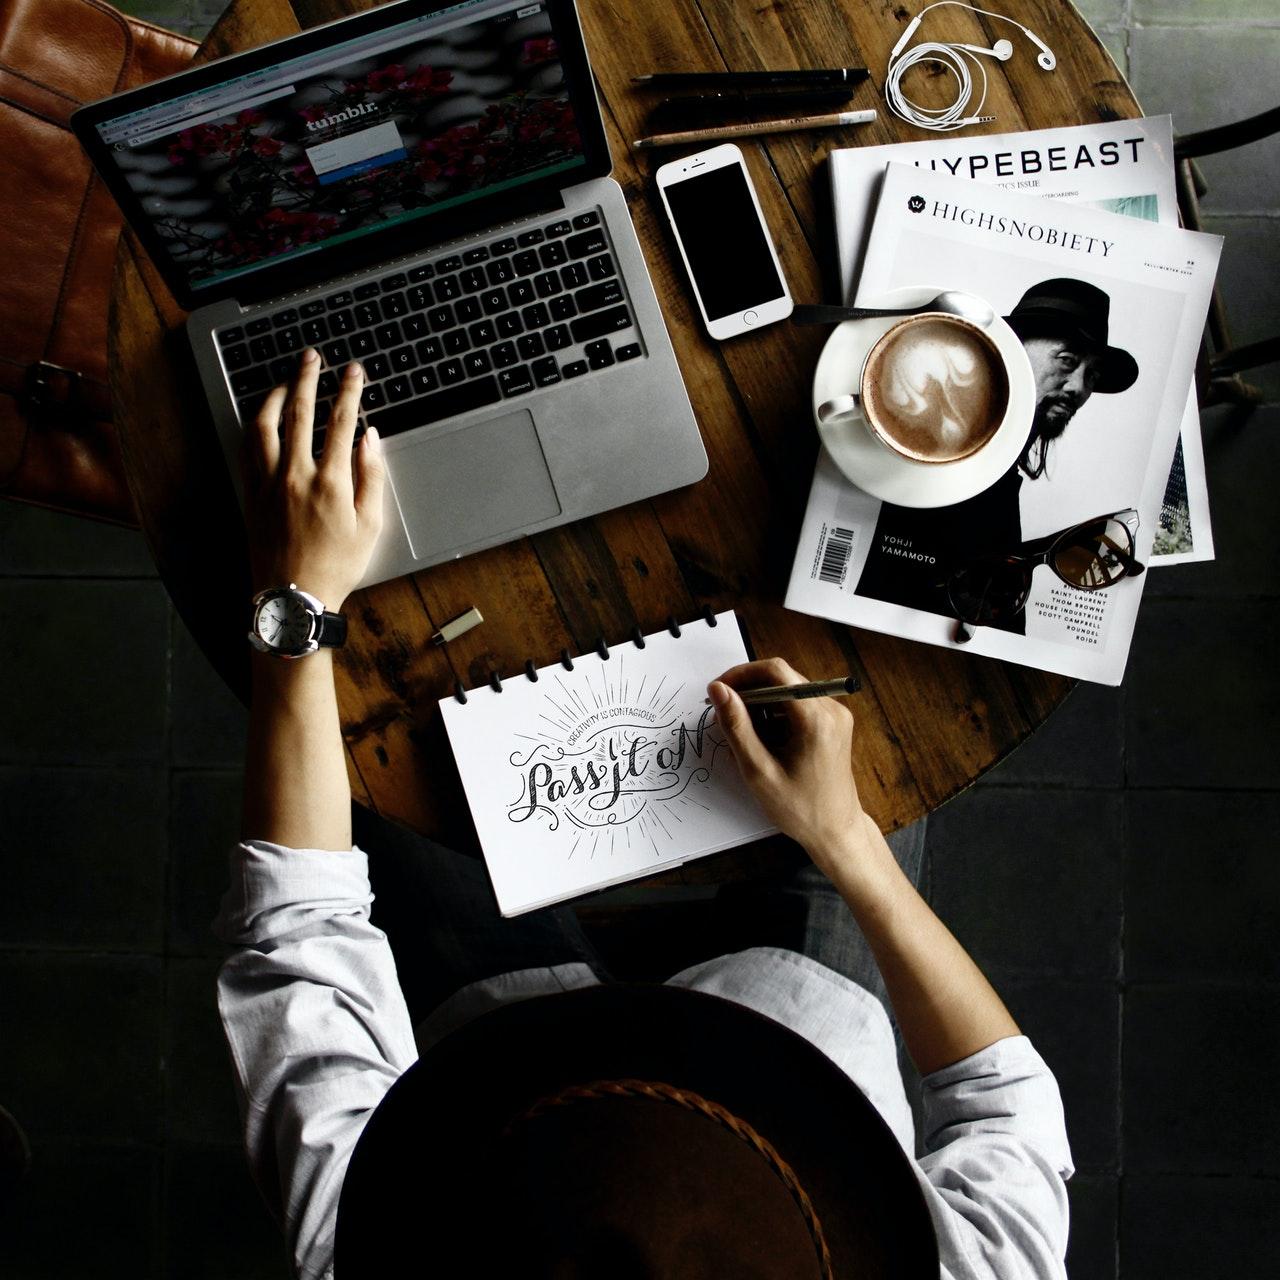 Woman working on logo design